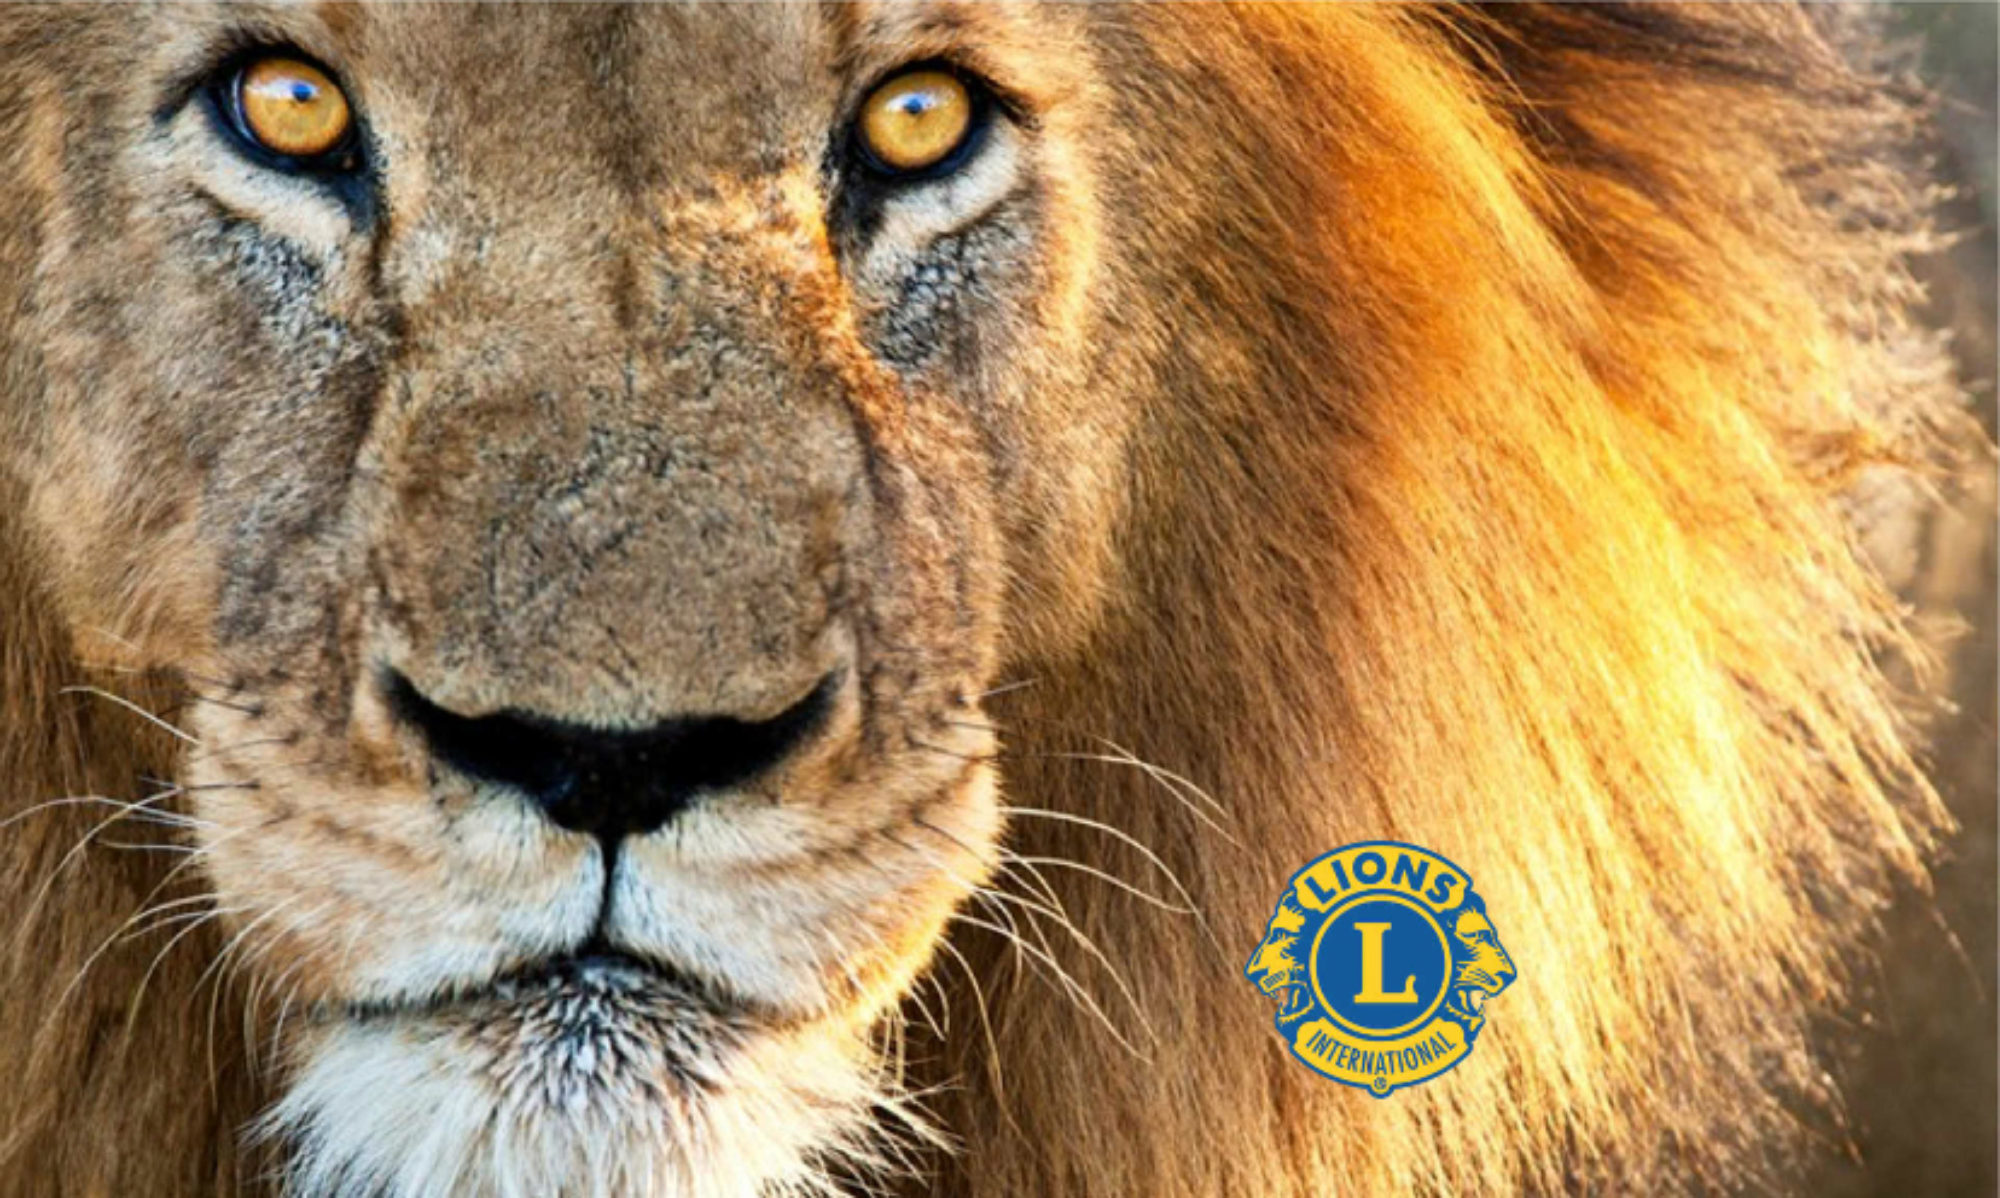 Elmet Lions Club Scrubs website